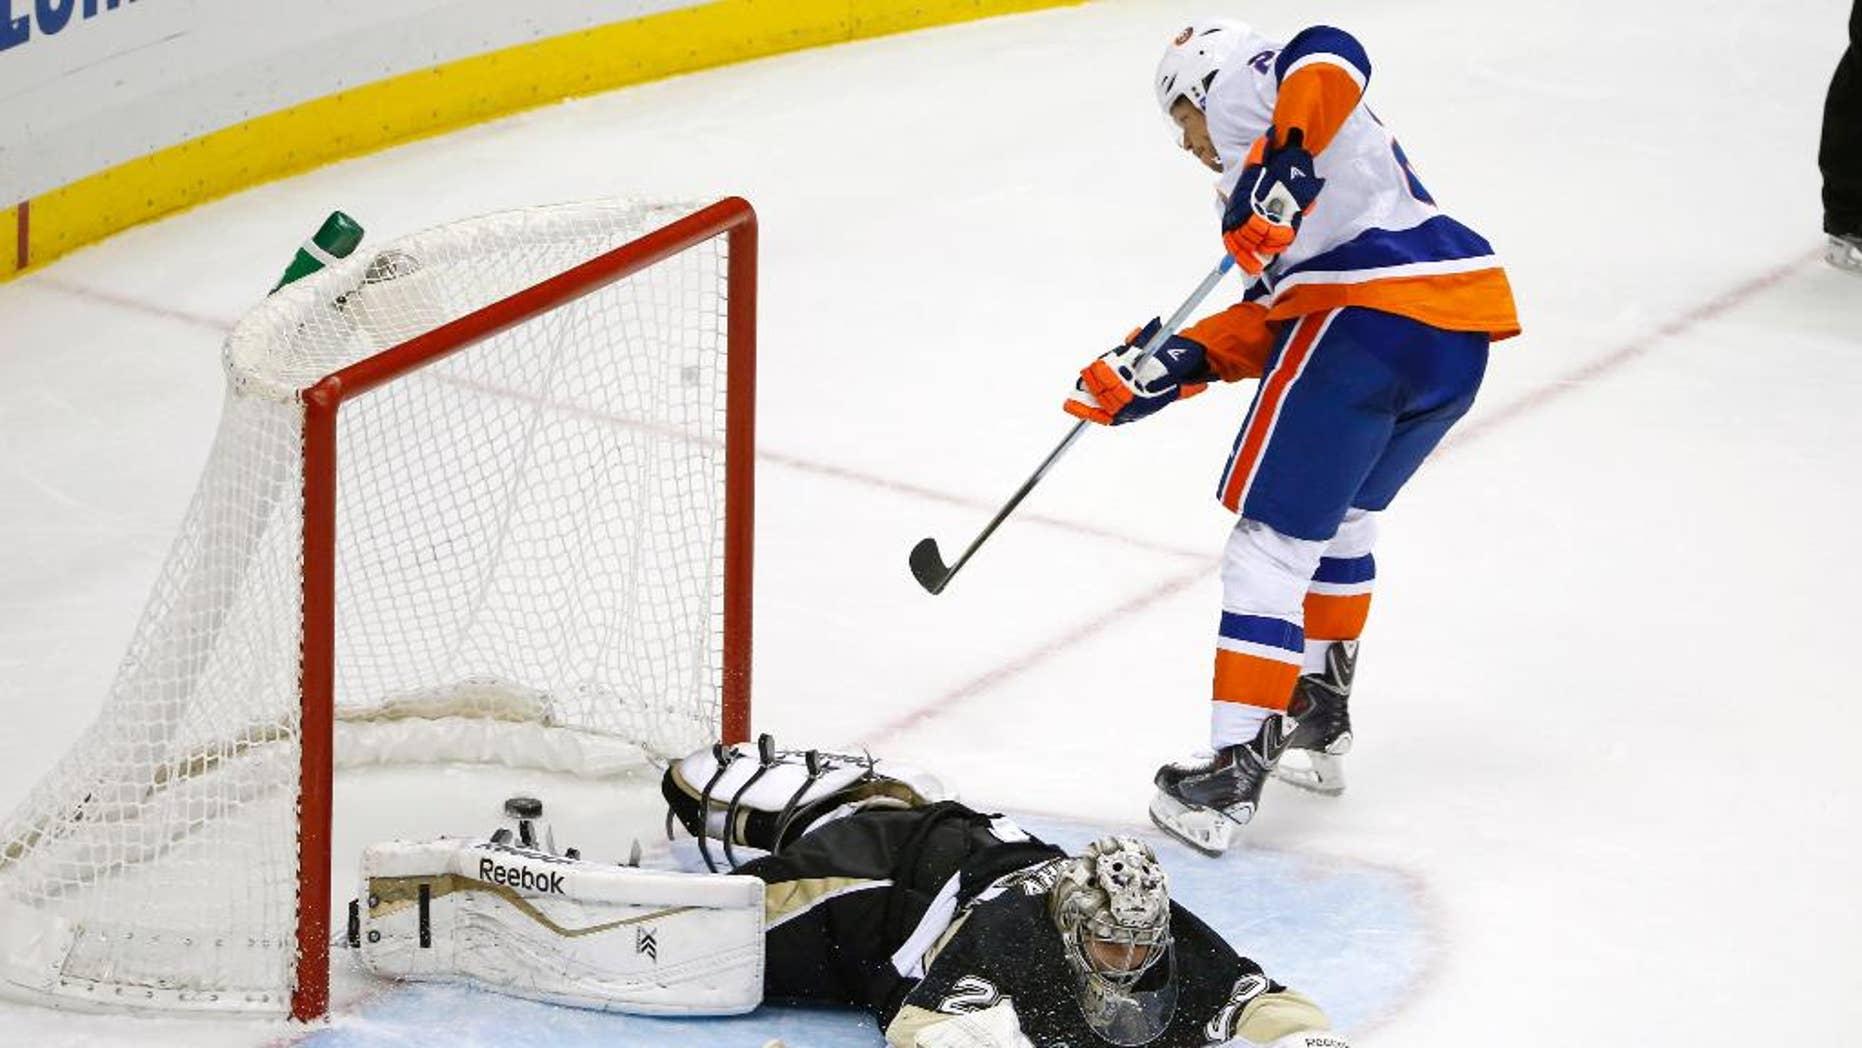 New York Islanders' Kyle Okposo (21) gets a game-winning shot past Pittsburgh Penguins goalie Marc-Andre Fleury (29) during a shootout of an NHL hockey game in Pittsburgh Friday, Nov. 21, 2014. The Islanders won 5-4. (AP Photo/Gene J. Puskar)